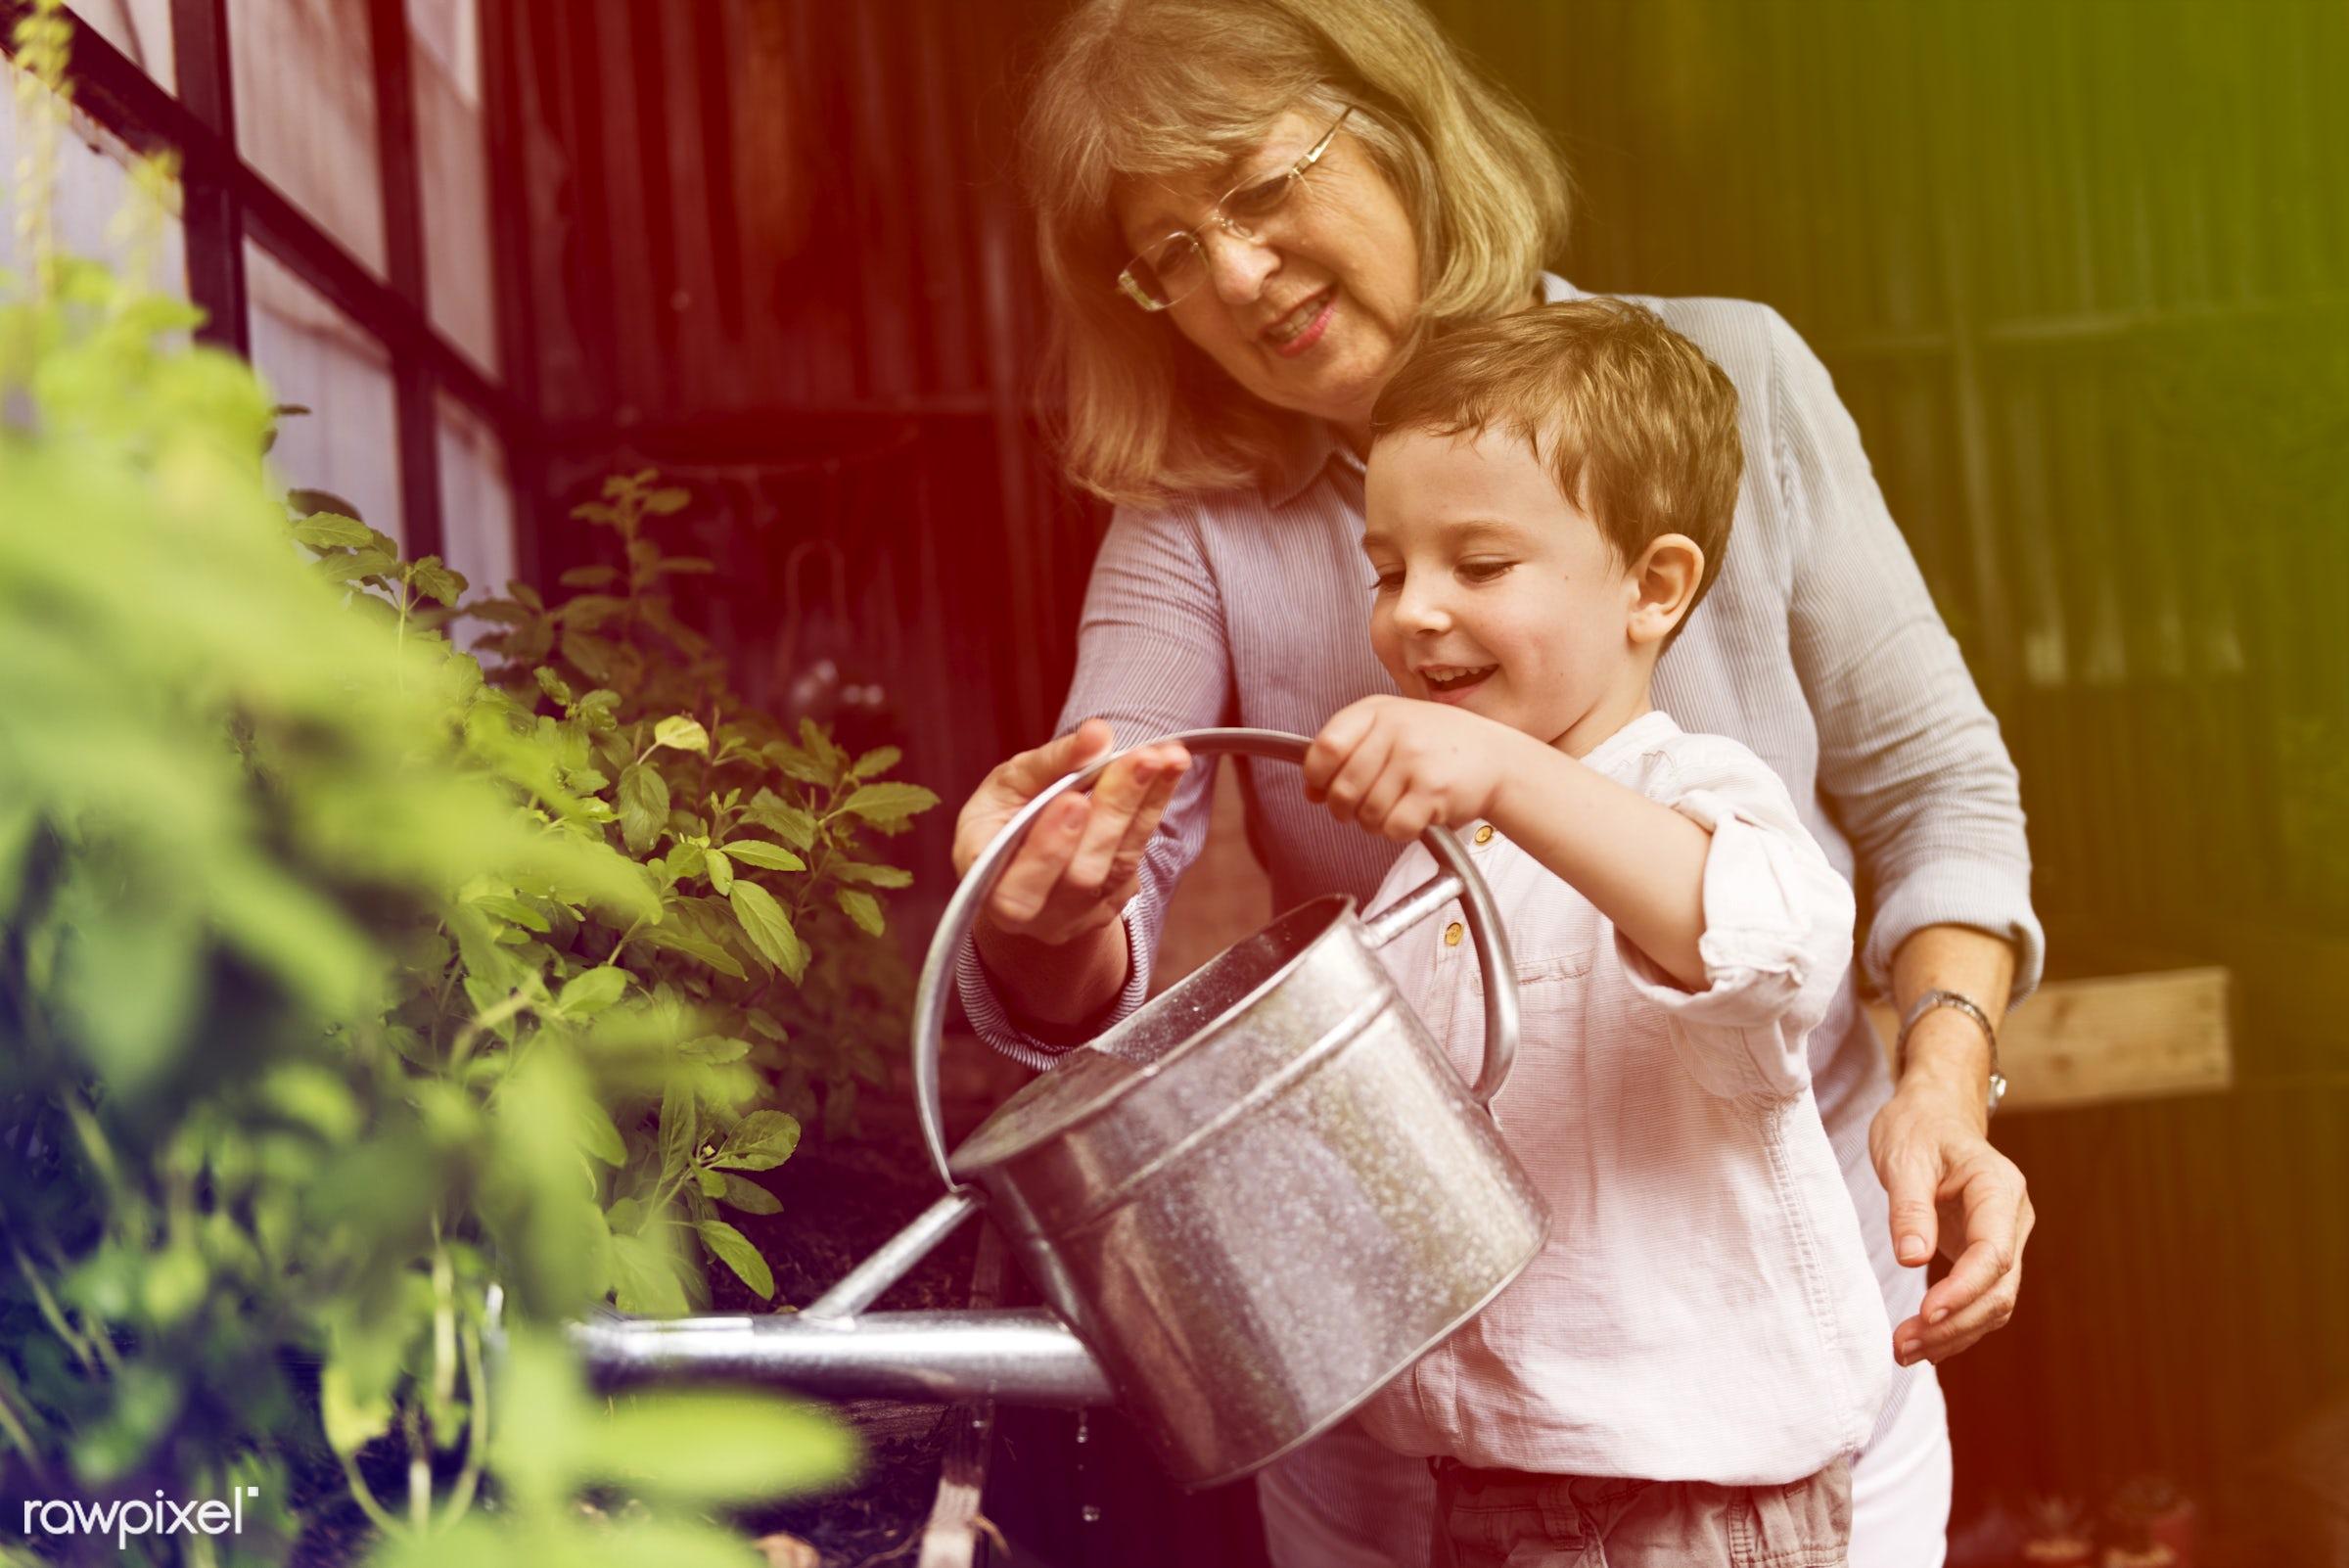 grandparent, activity, adult, boy, child, childhood, children, ecology, environment, family, filter, free time, gardening,...